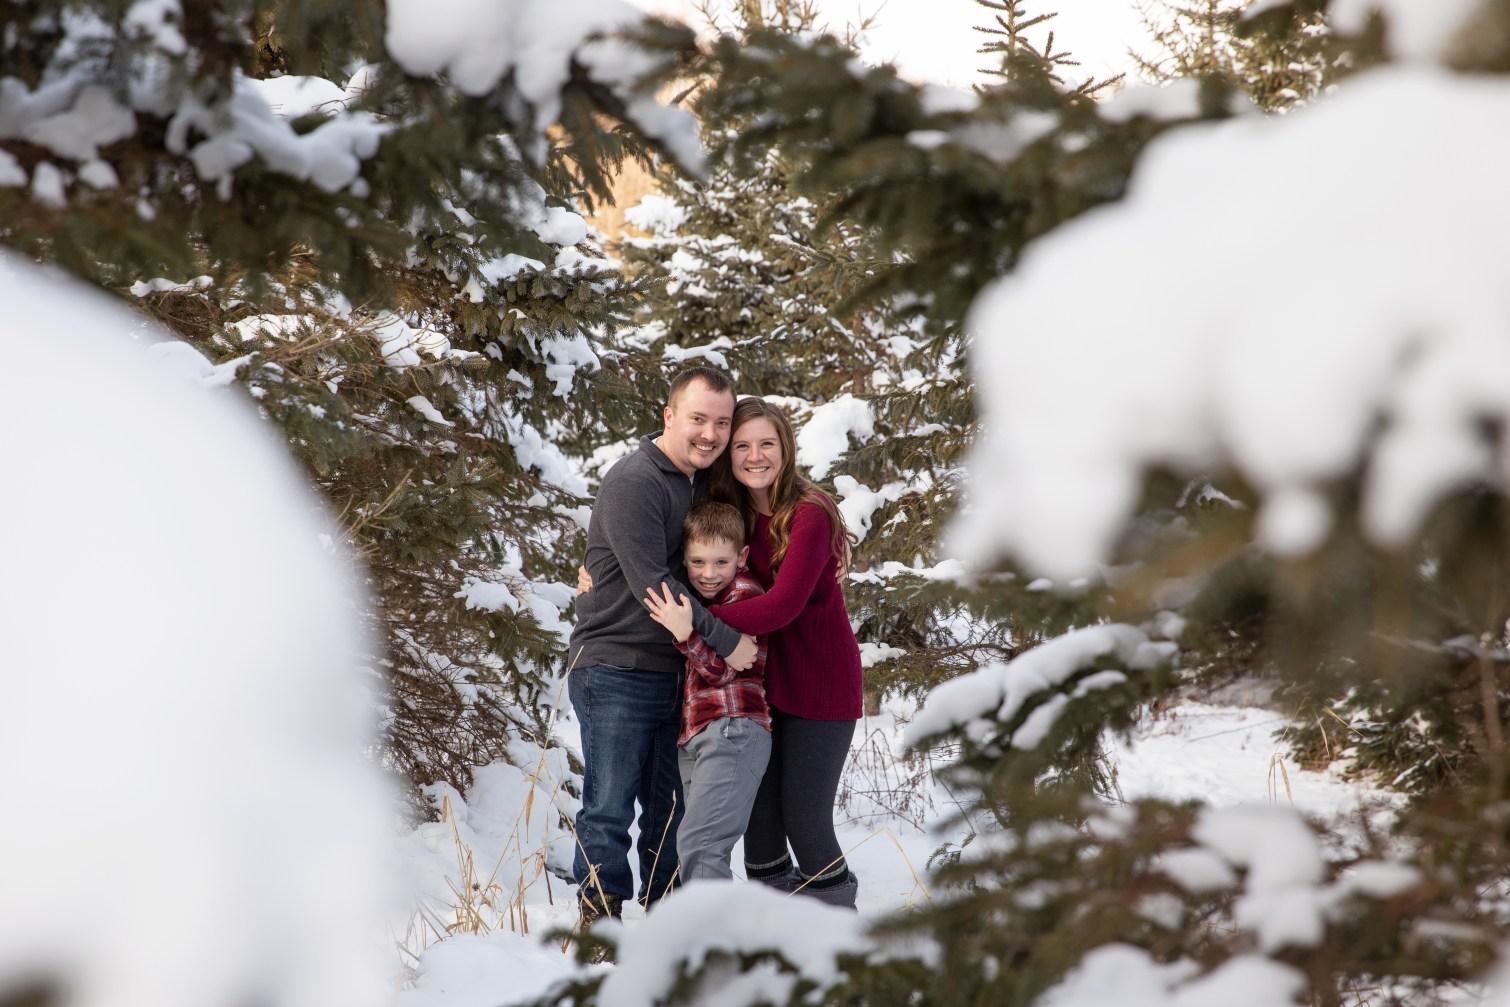 Beautiful outdoor winter family photo session by MN Family Photographer Nicki Joachim Photography of Owatonna, Minnesota